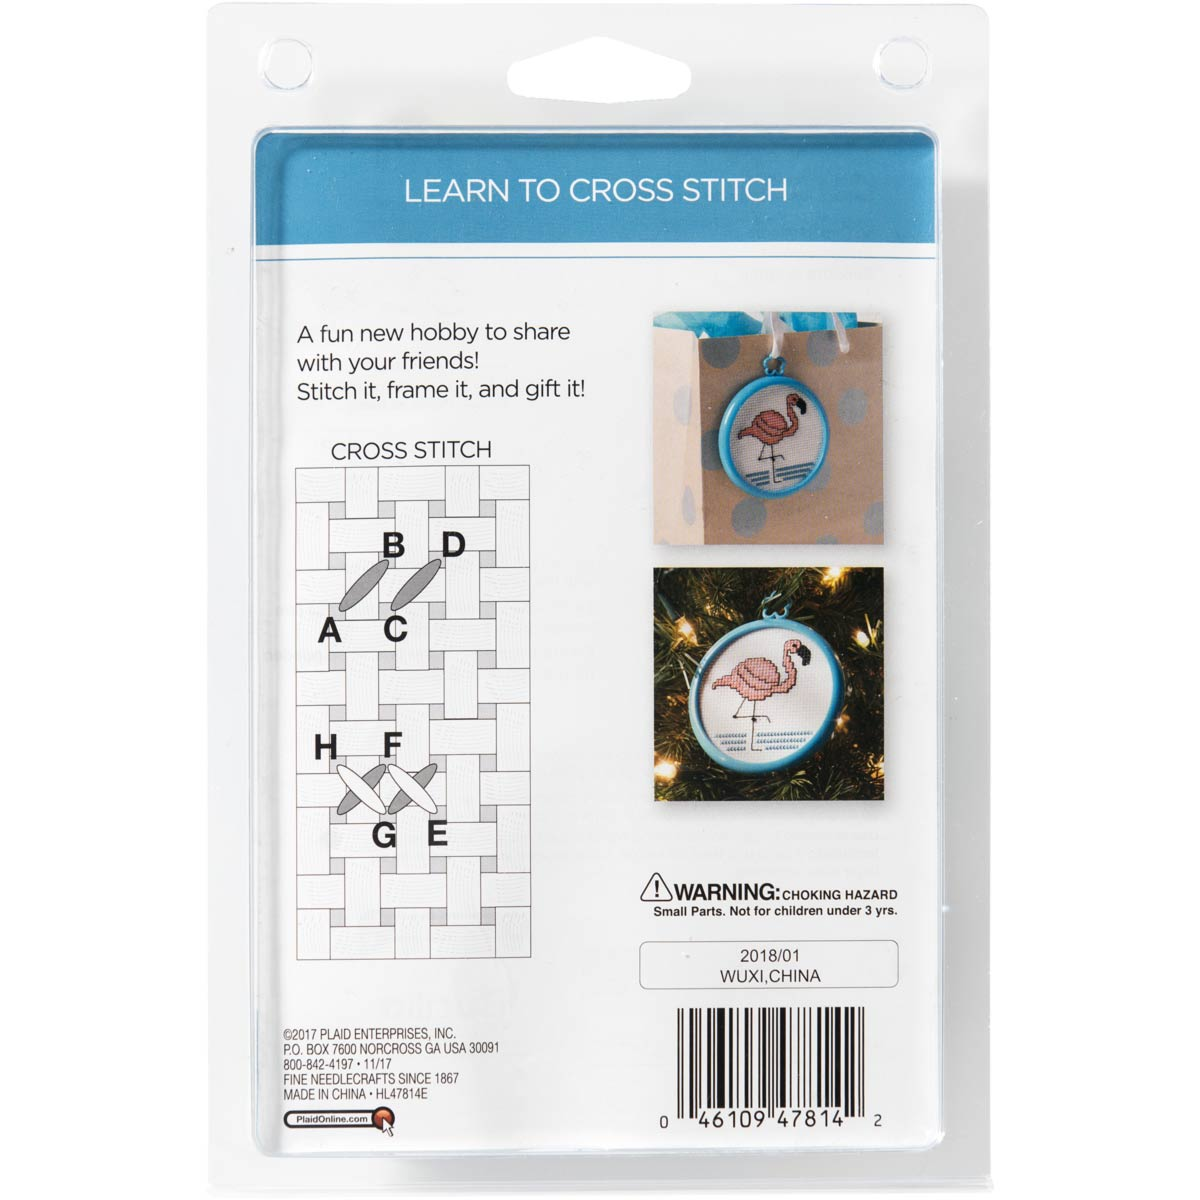 Bucilla ® My 1st Stitch™ - Counted Cross Stitch Kits - Mini - Tropical Flamingo - 47814E